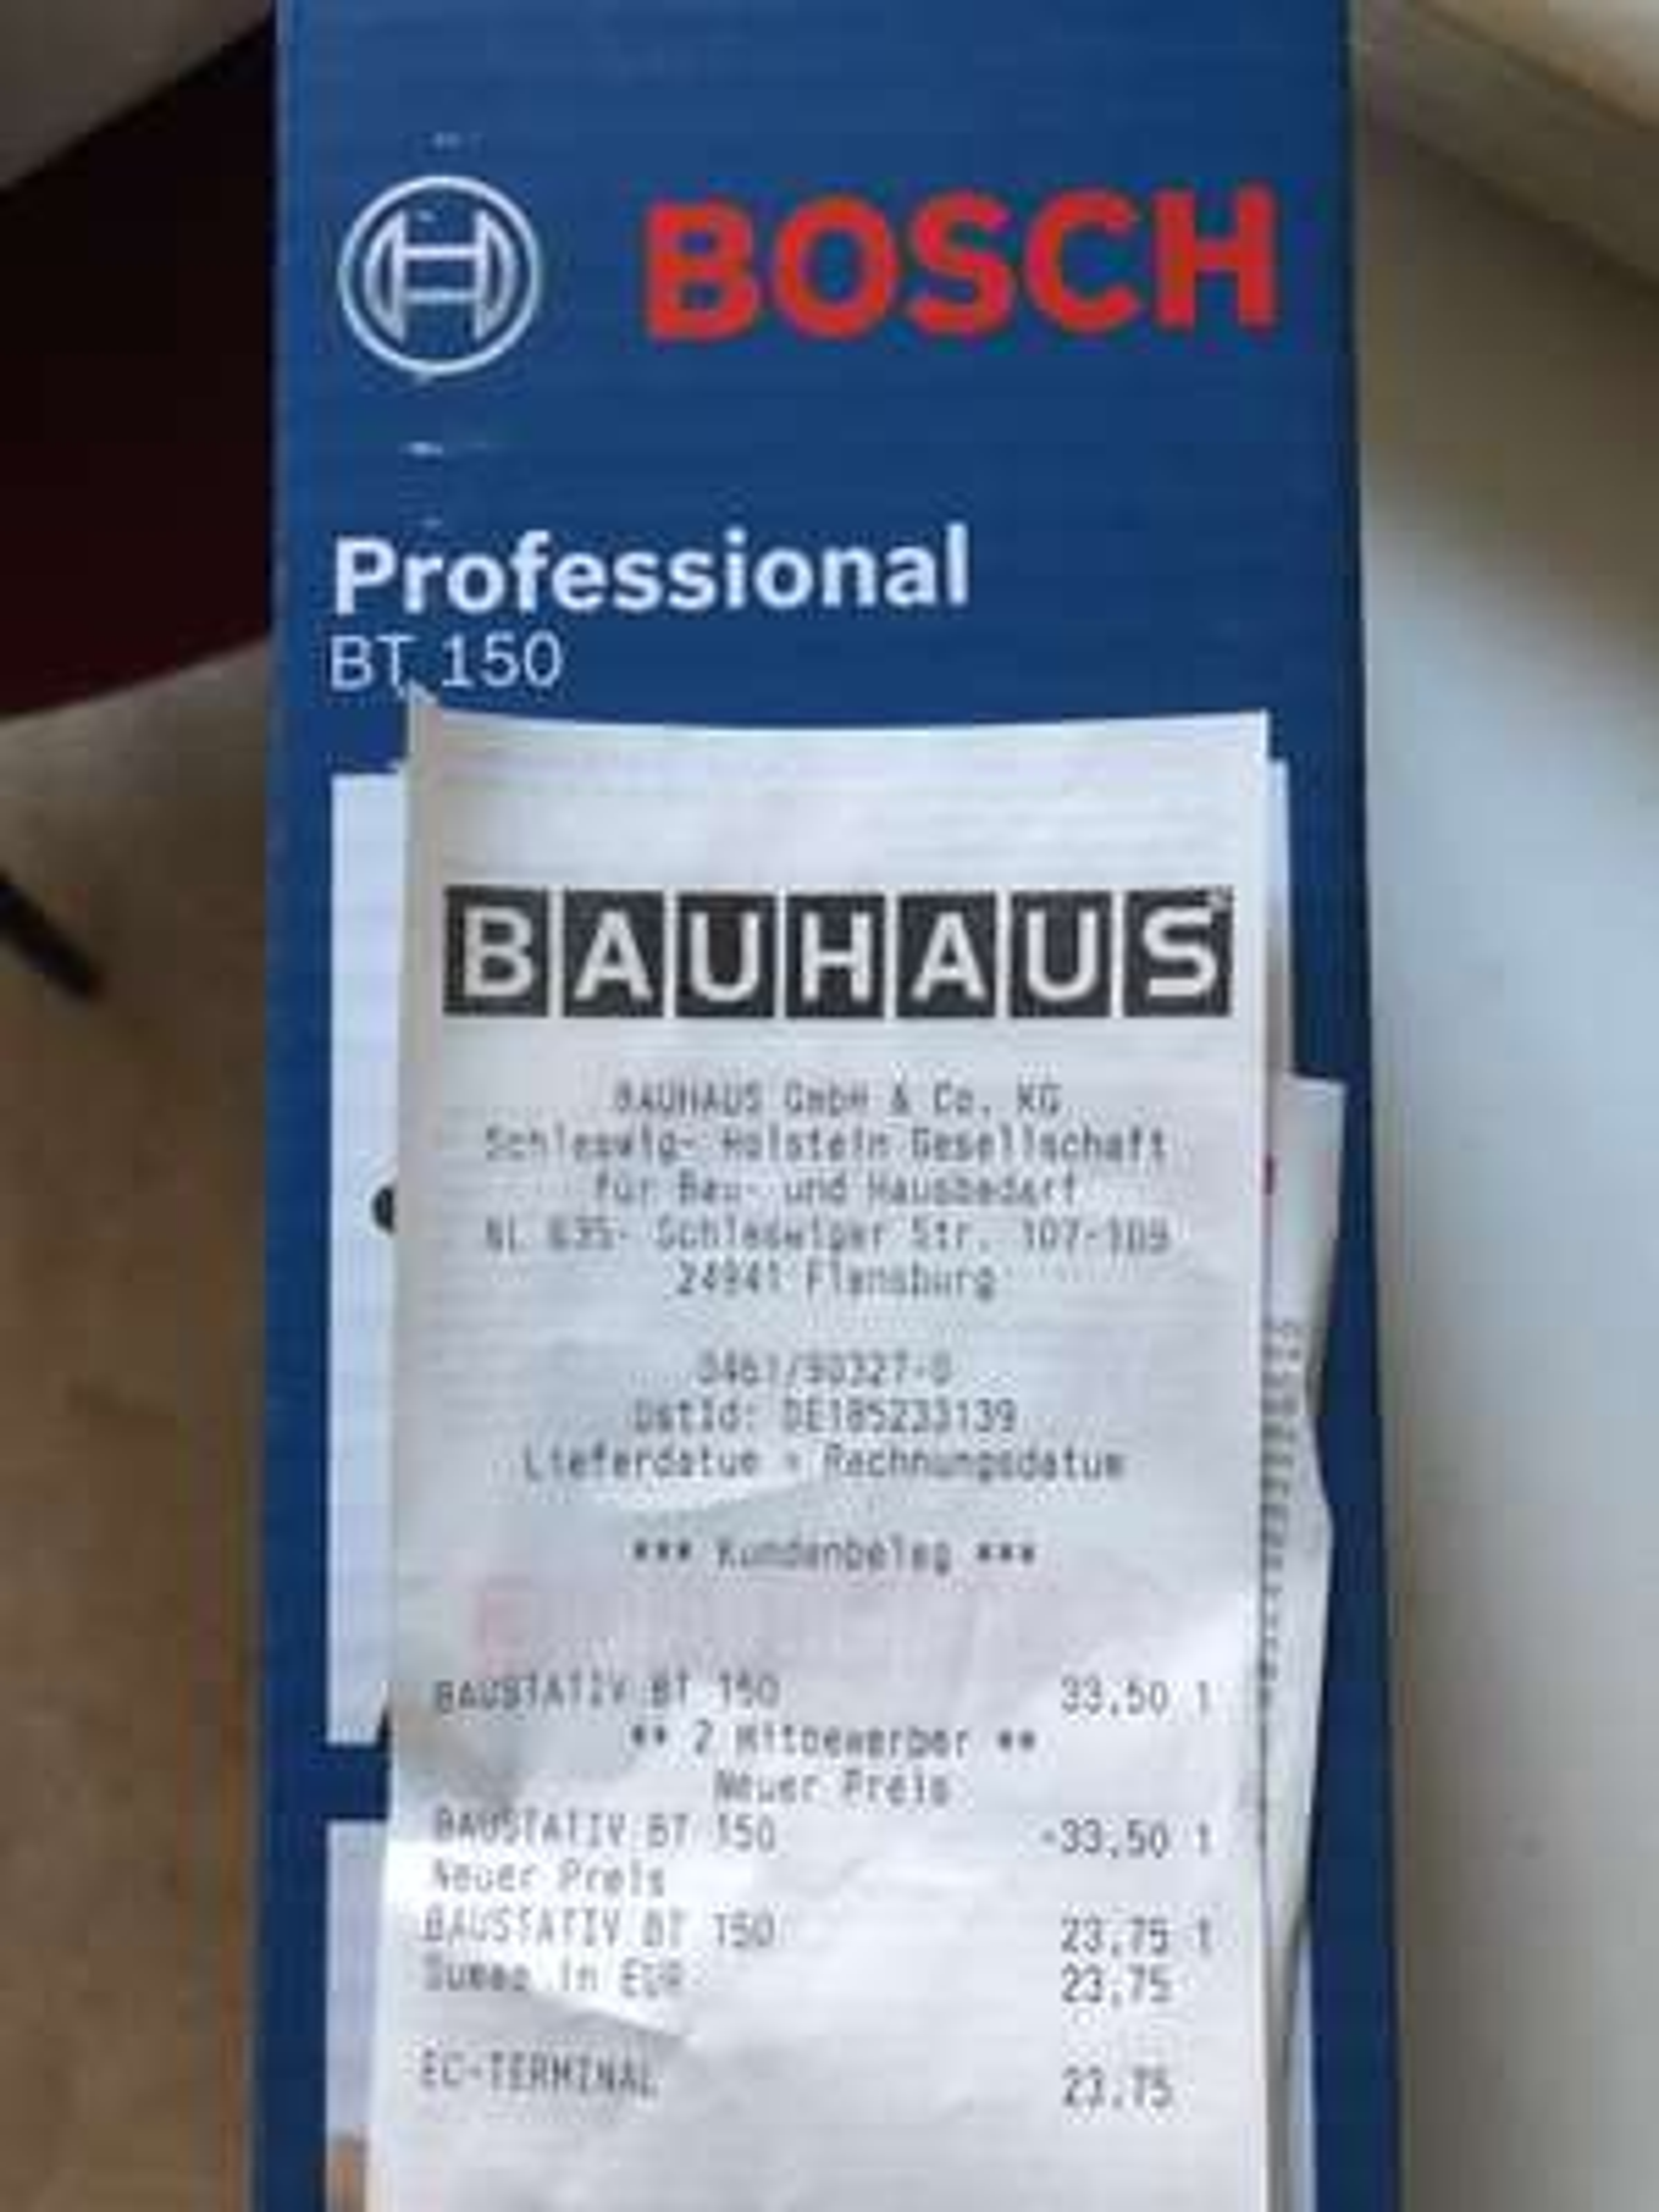 Bauhaus: Baustativ Bosch Professional BT150 mit TPG